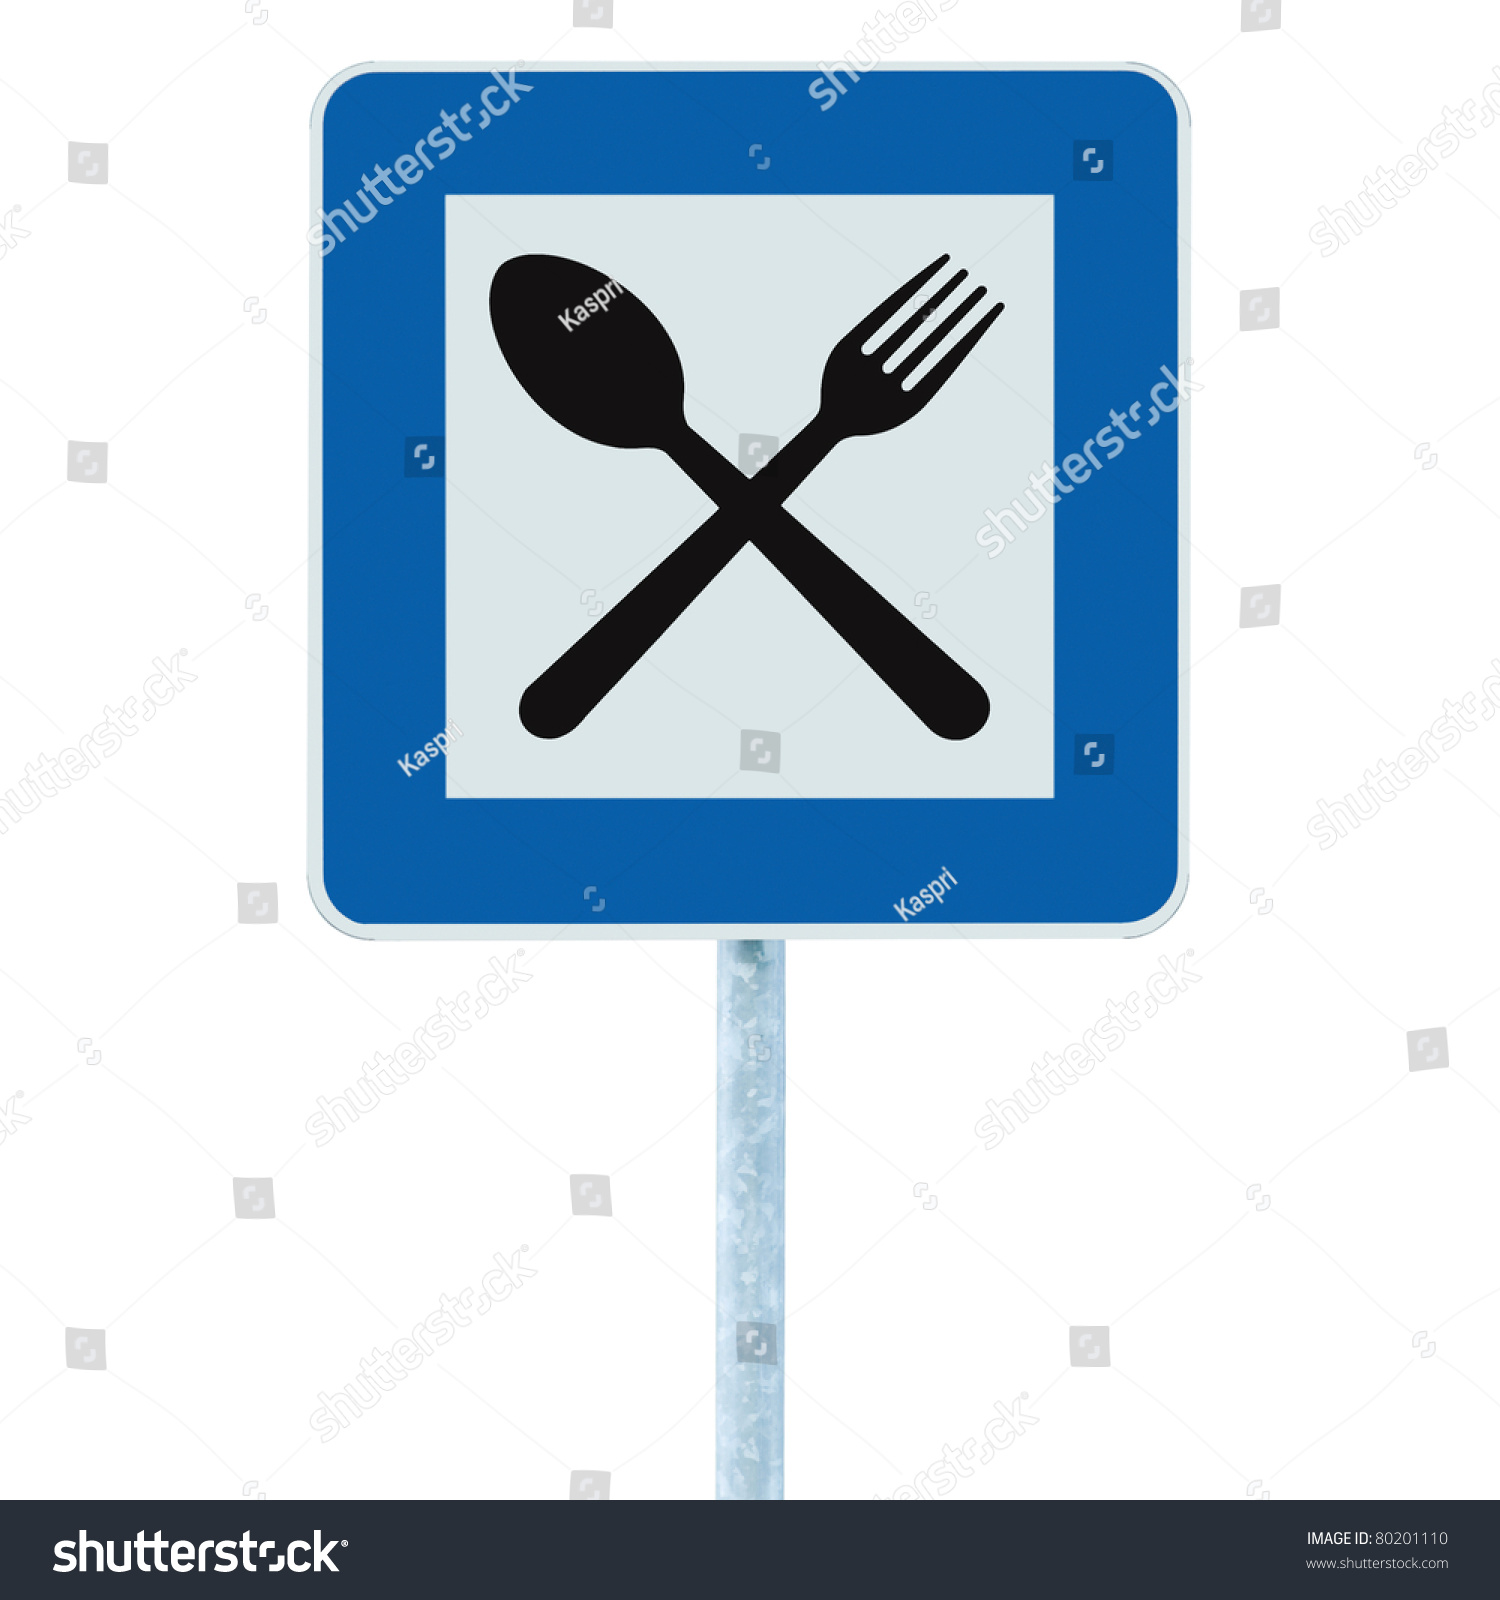 Restaurant Sign On Post Pole Traffic Road Roadsign Blue